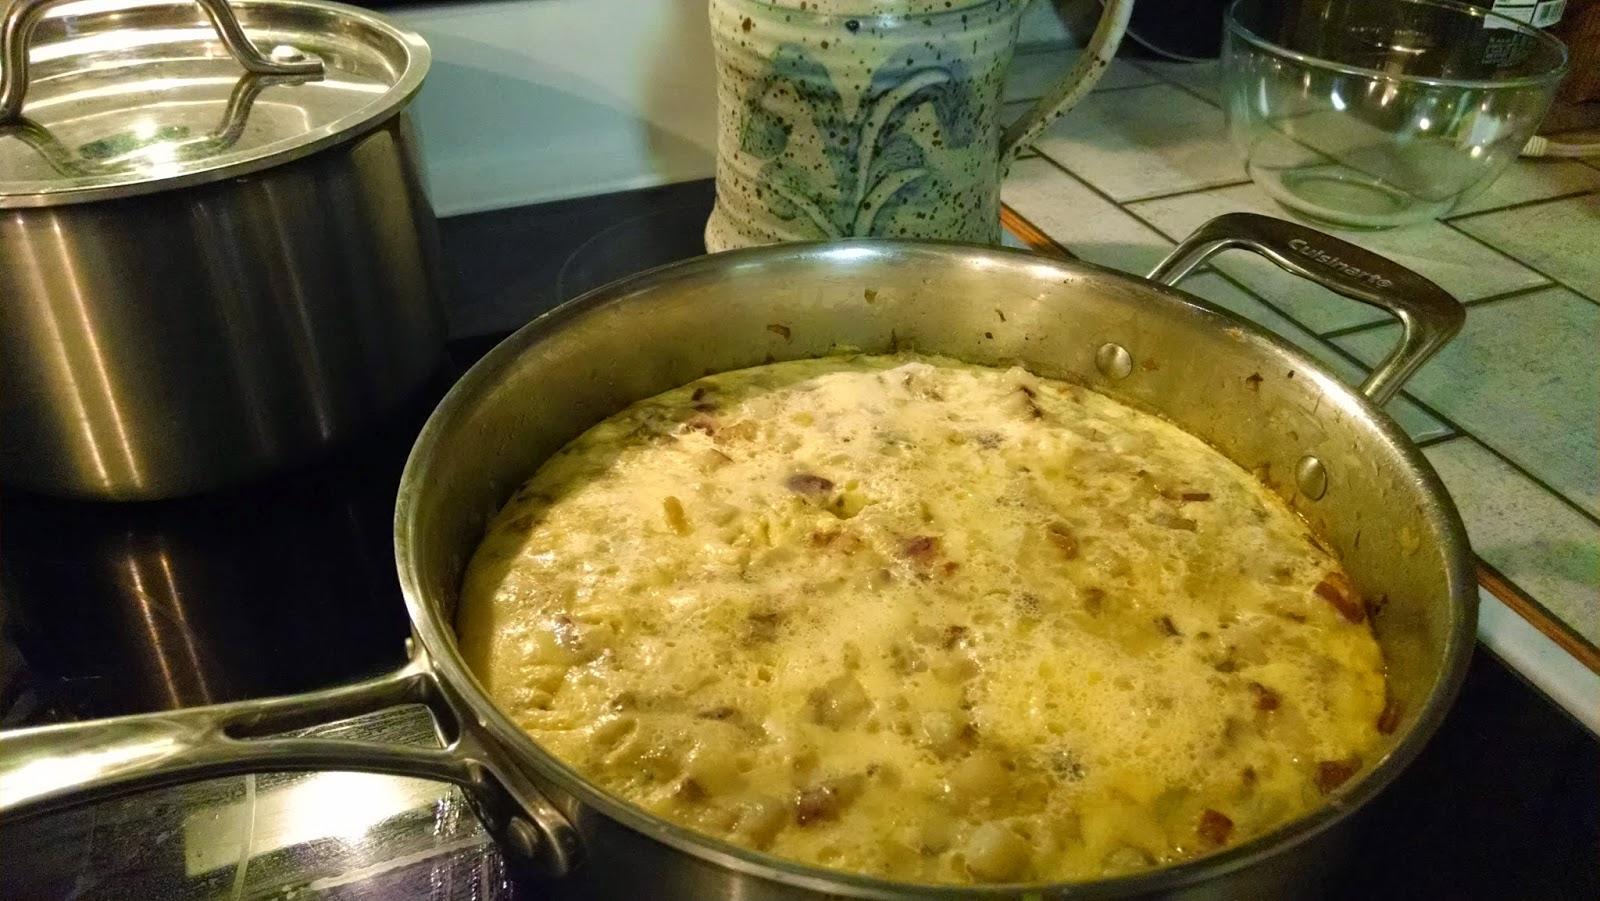 eggs and potato dish